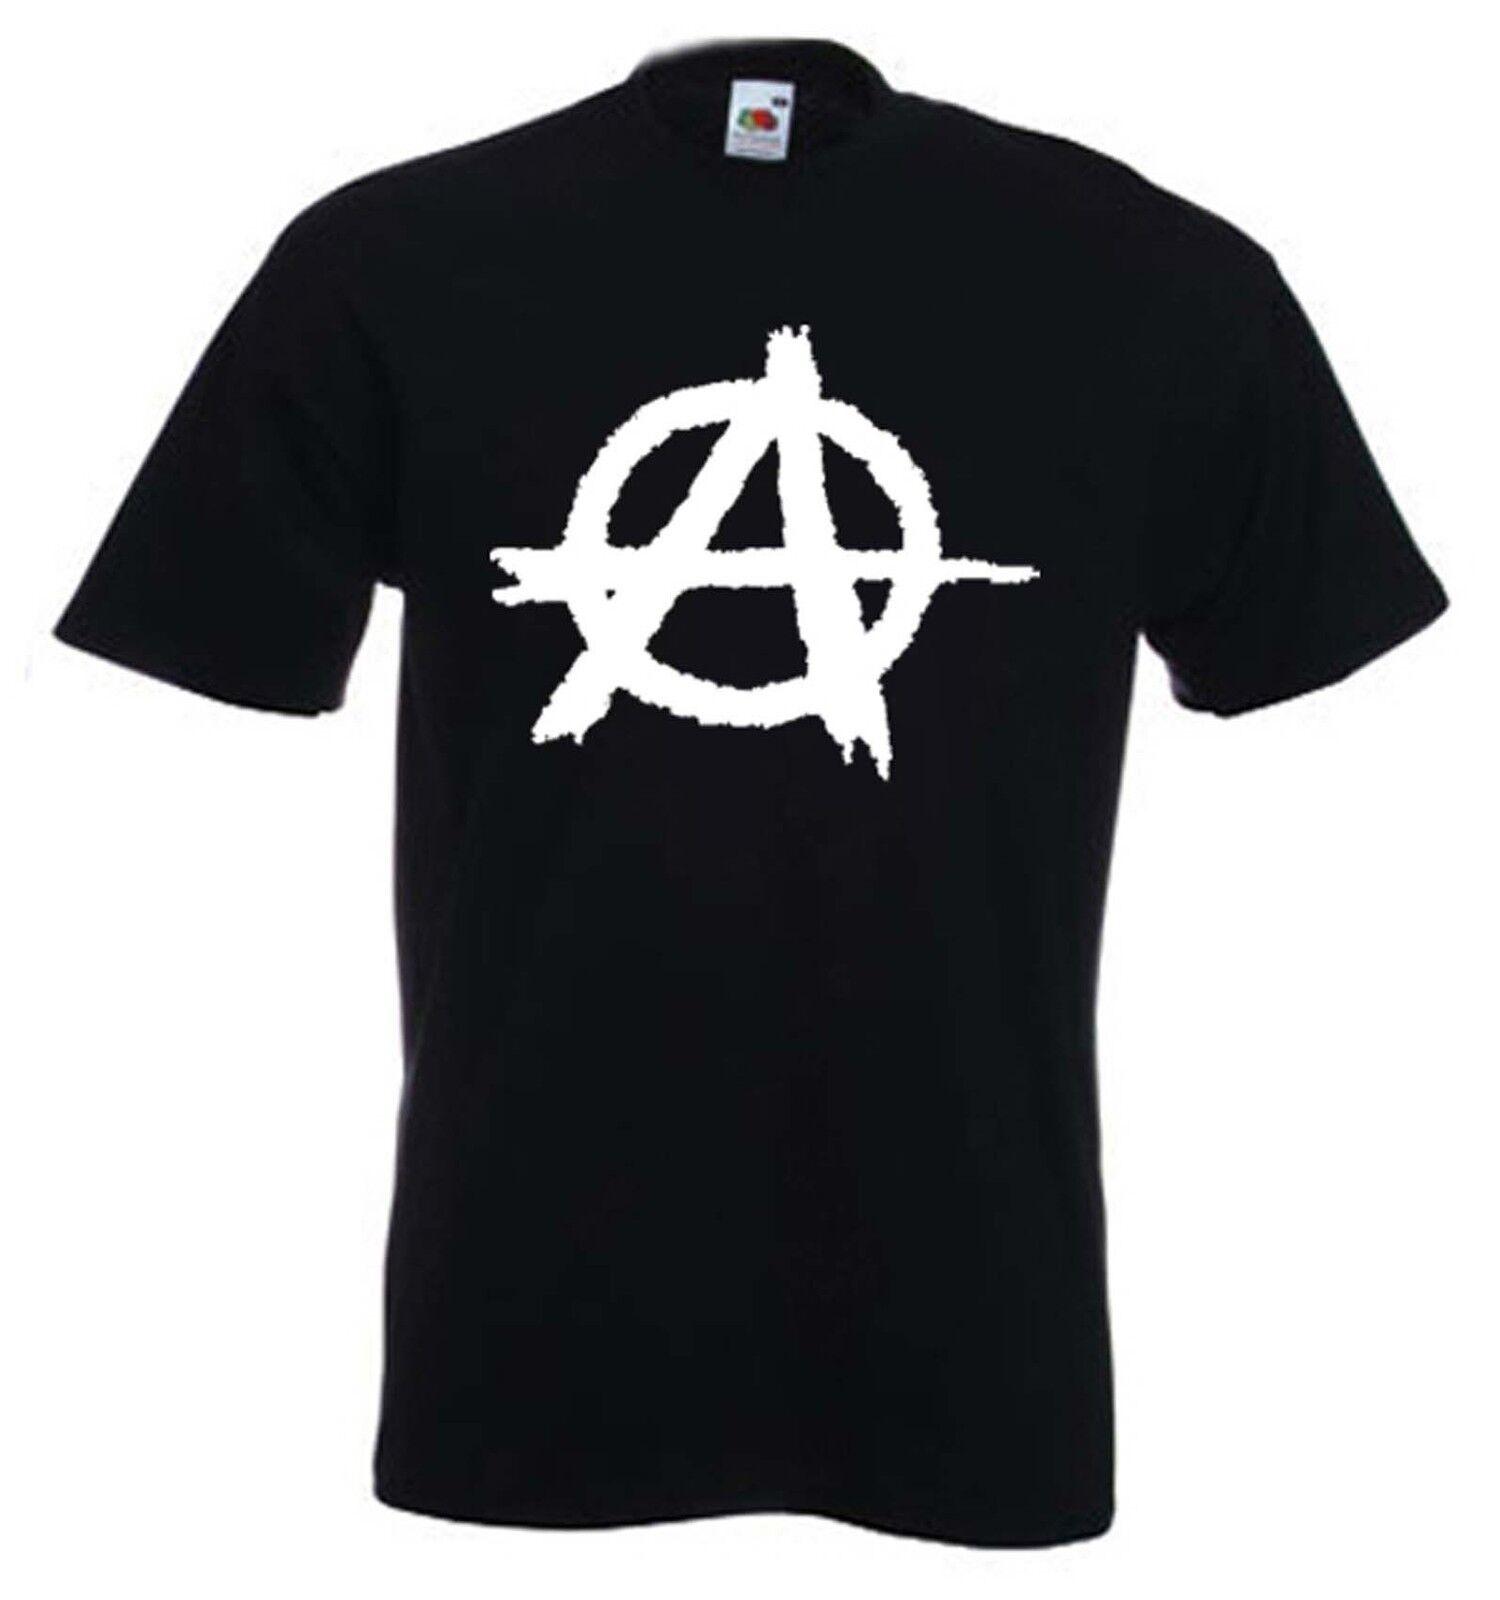 Anarchy Symbol T Shirt Punk Sex Pistols Anarchism Anarchist Size